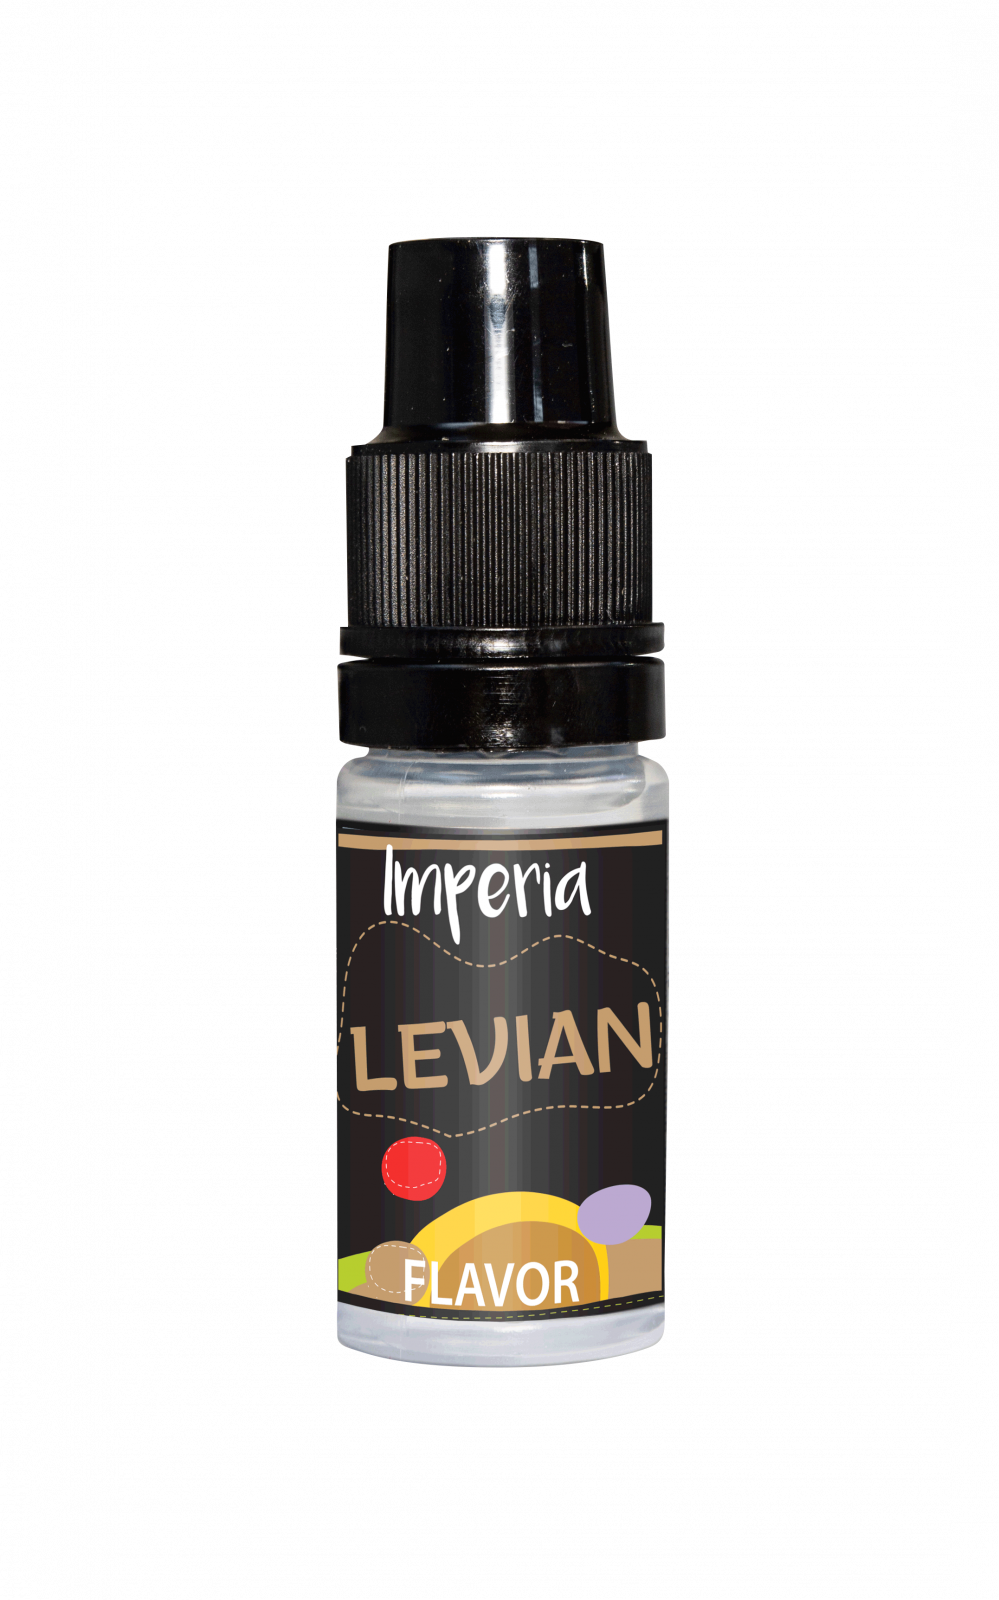 Levian - Aroma Imperia Black Label Boudoir Samadhi s.r.o.